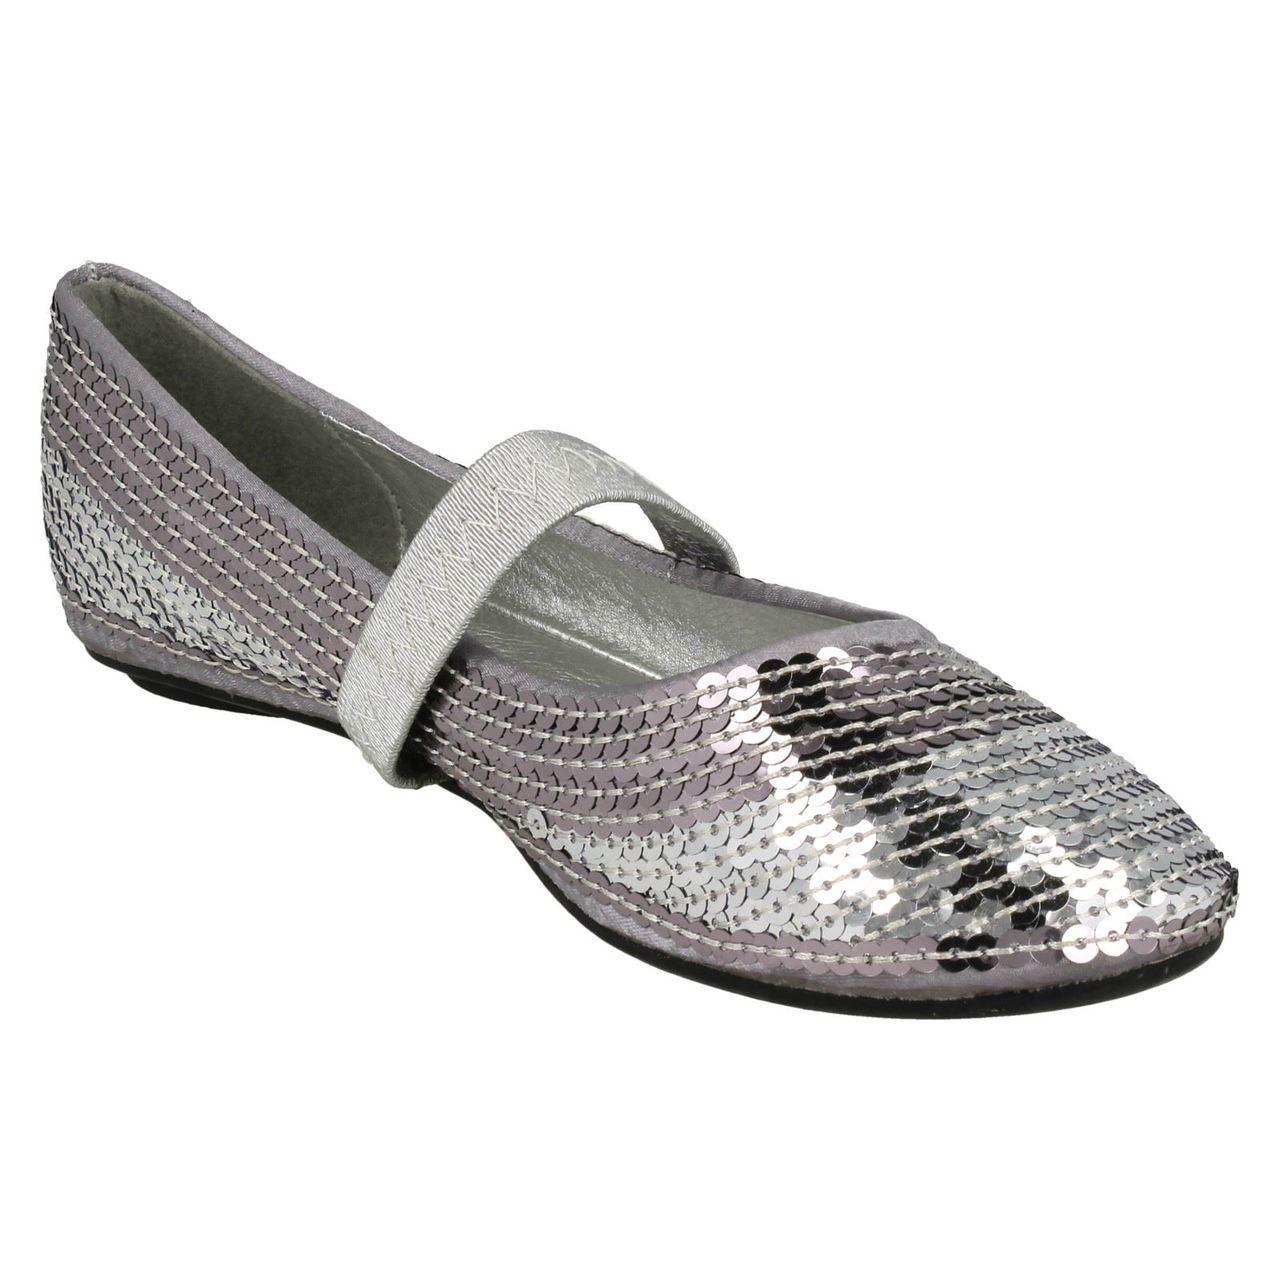 Niñas Spot on H2200 Zapatos Planos el estilo ~ K